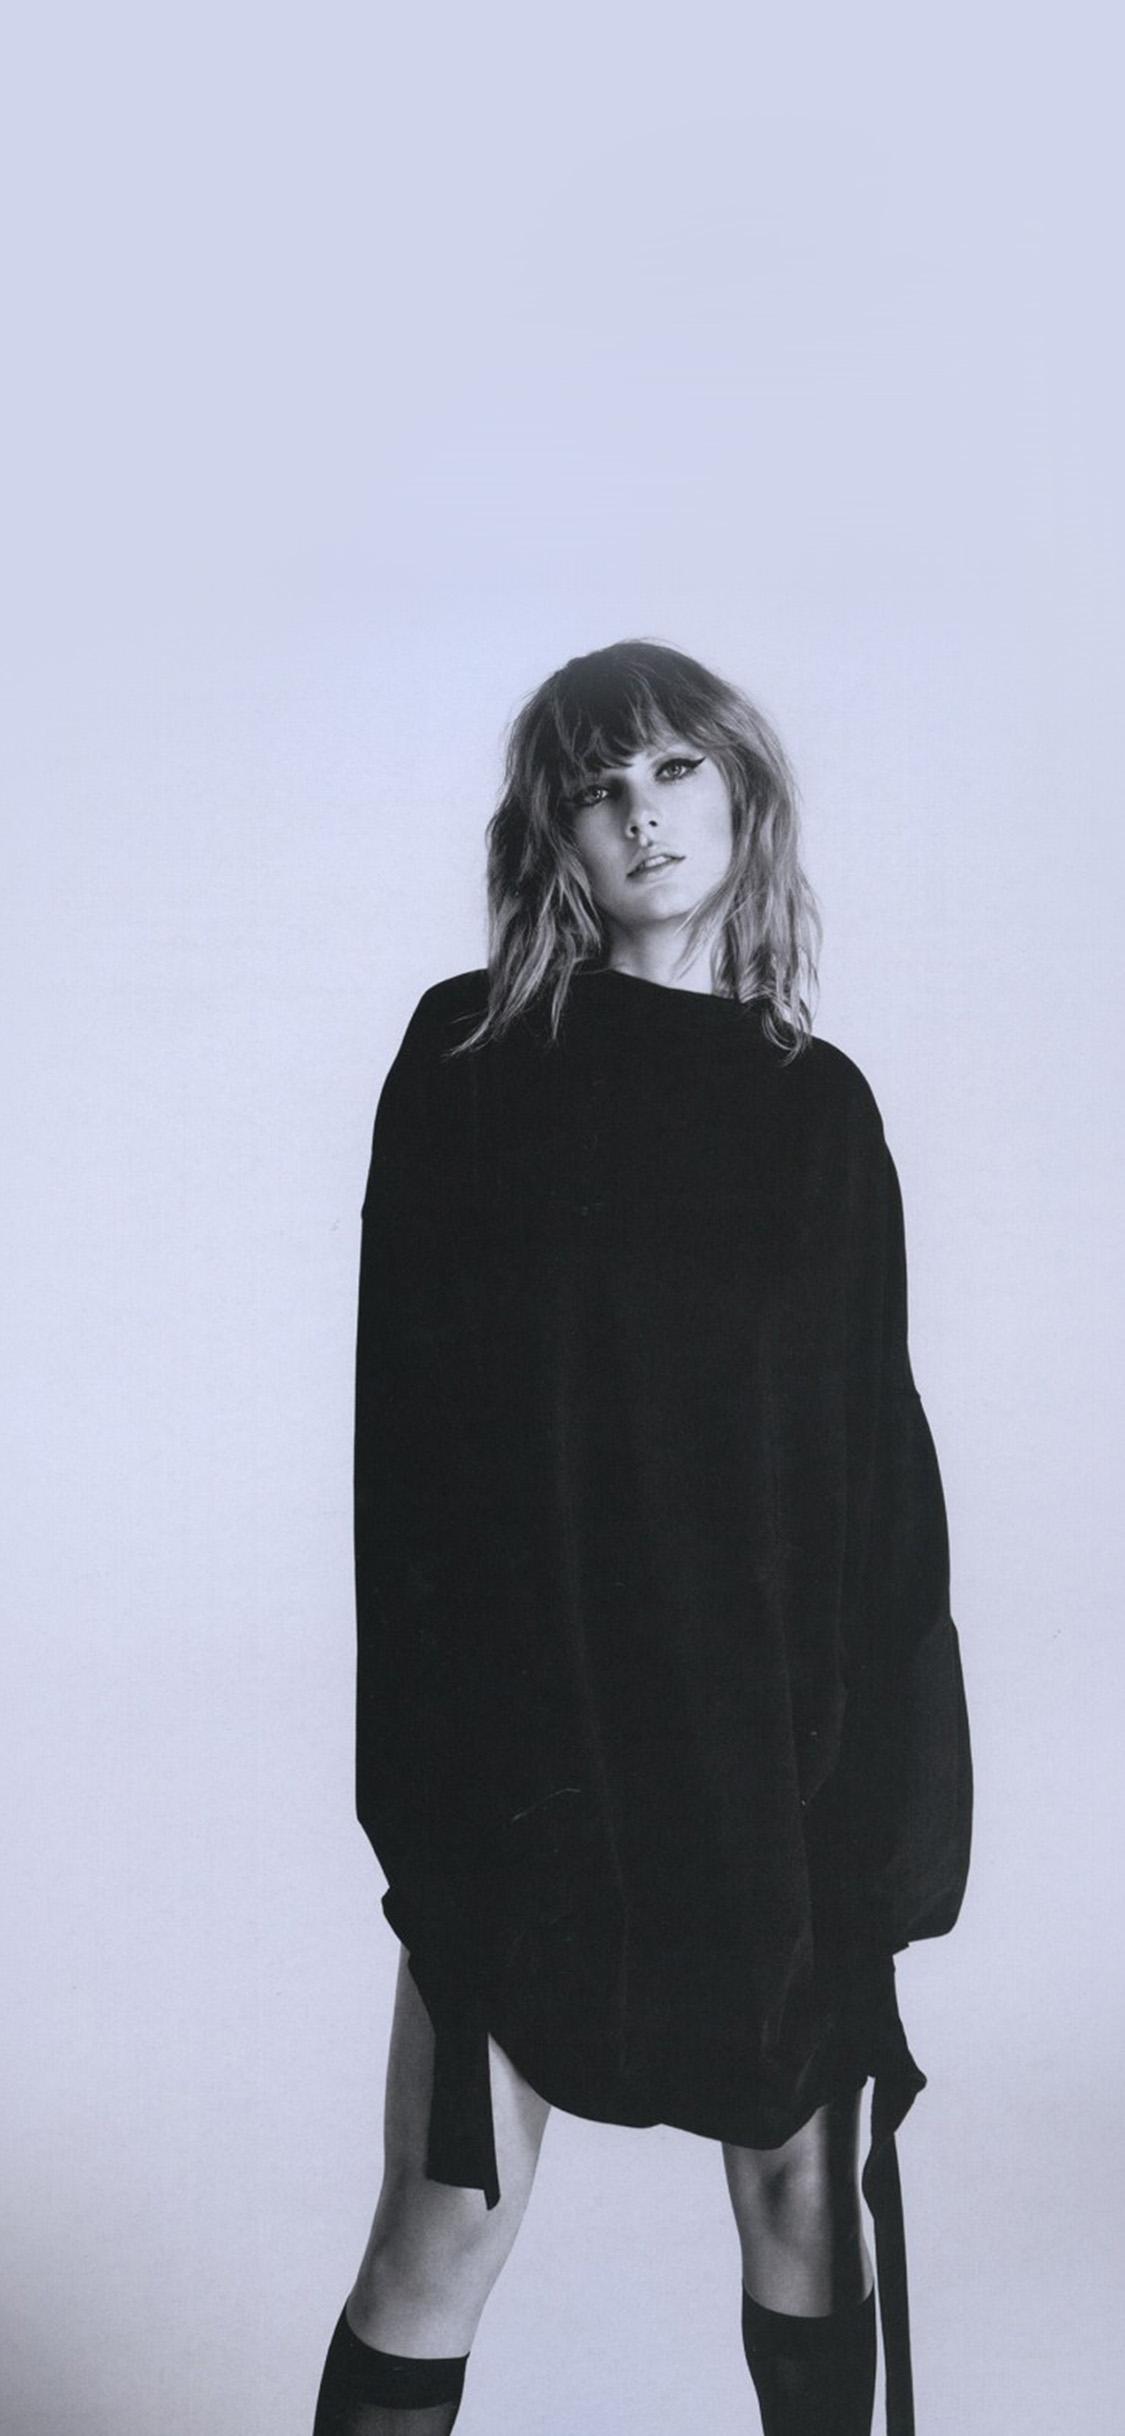 iPhonexpapers.com-Apple-iPhone-wallpaper-hr32-girl-singer-artist-music-taylor-swift